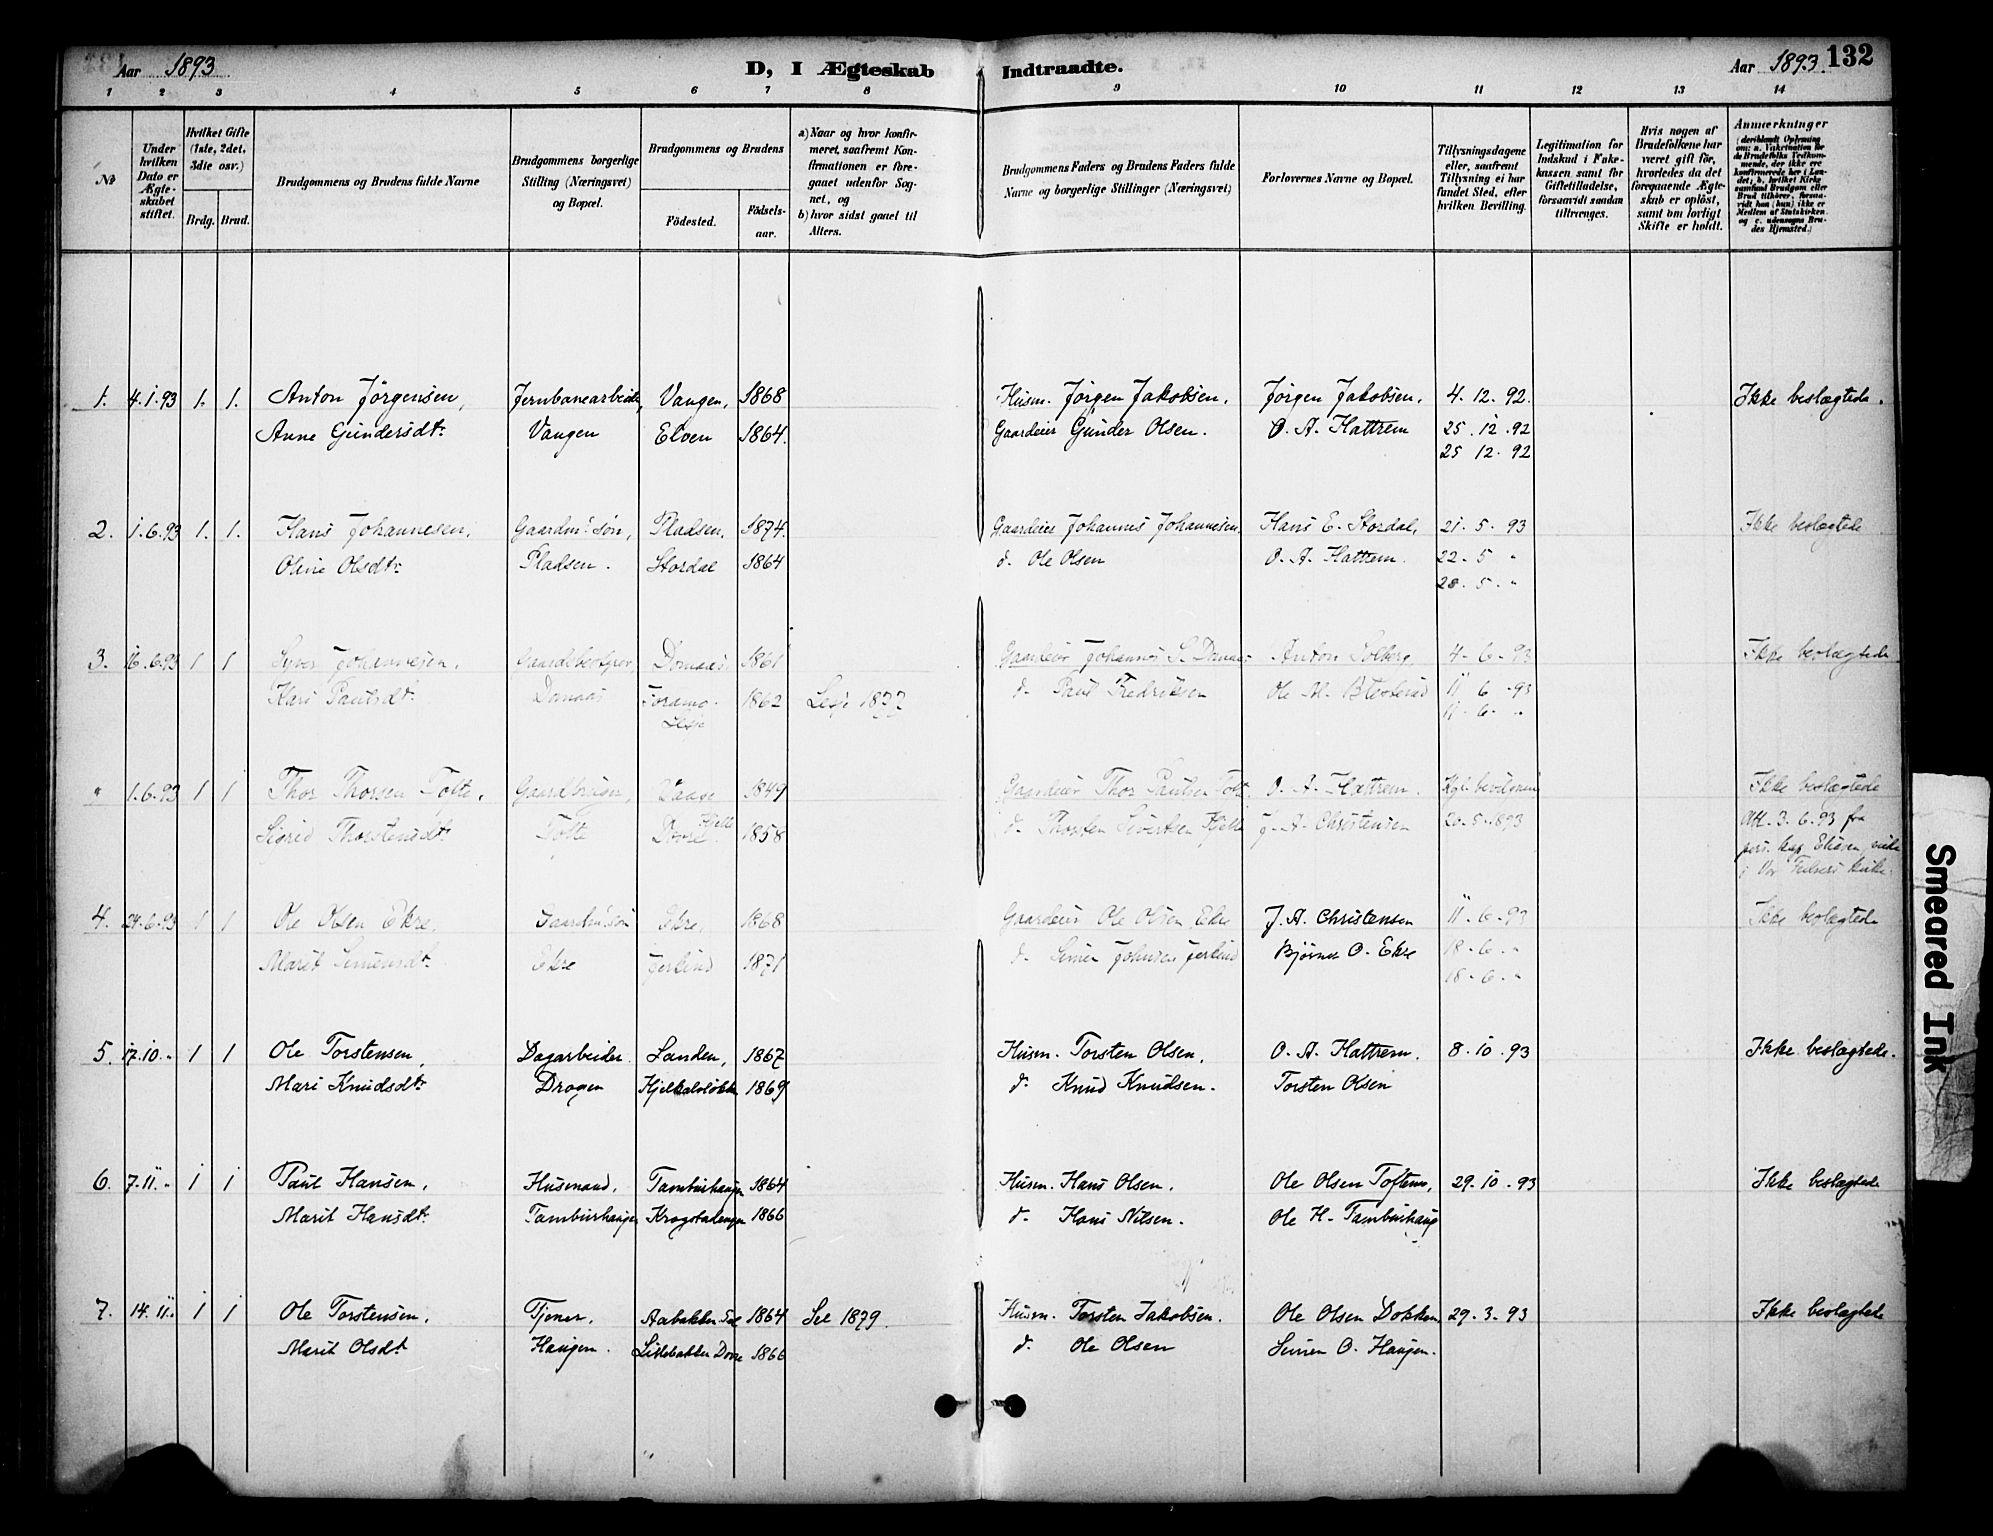 SAH, Dovre prestekontor, Ministerialbok nr. 3, 1891-1901, s. 132